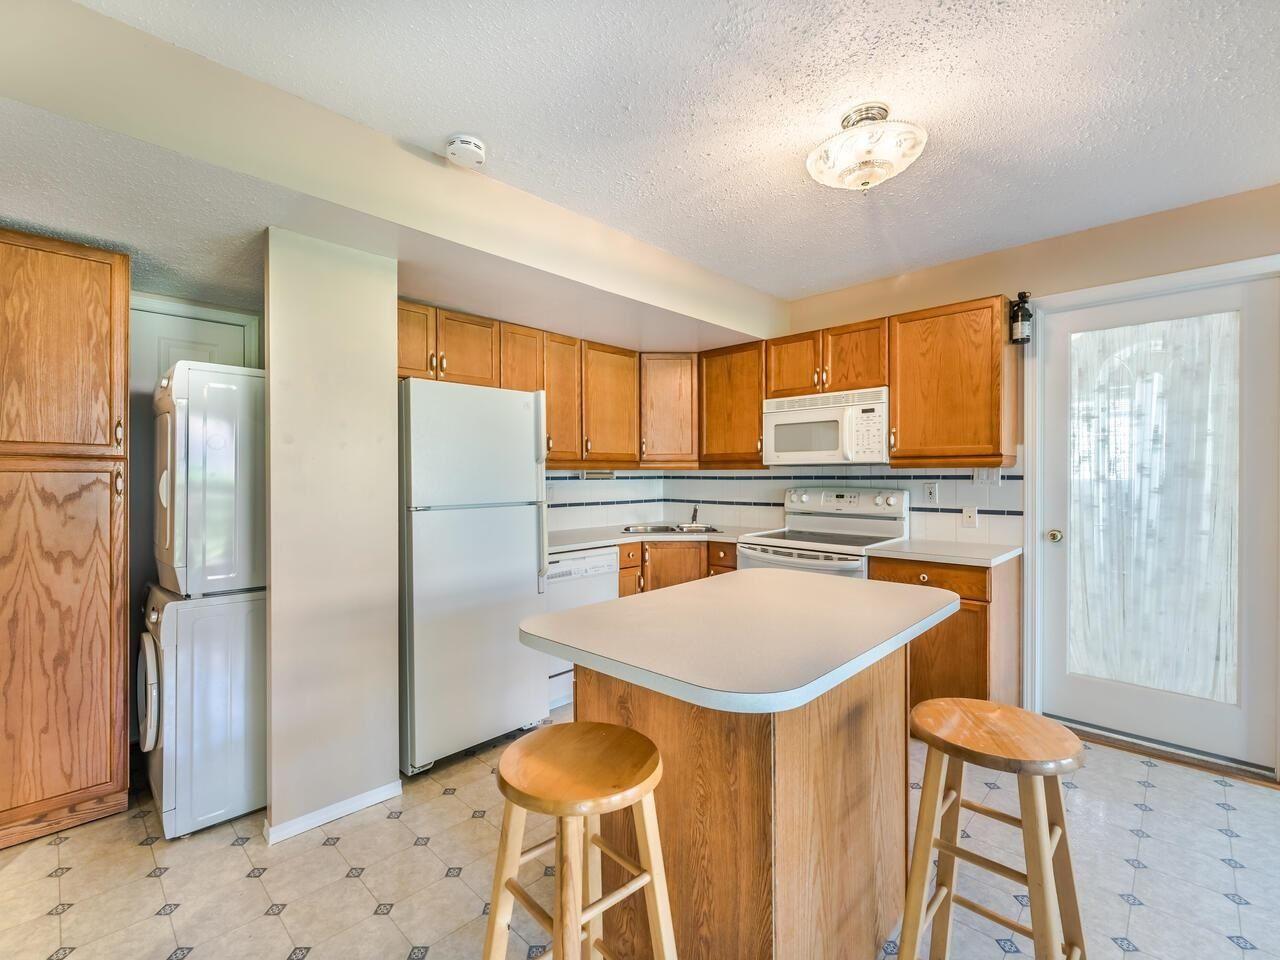 Photo 25: Photos: 5602 WILSON Court in Richmond: Hamilton RI House for sale : MLS®# R2602420